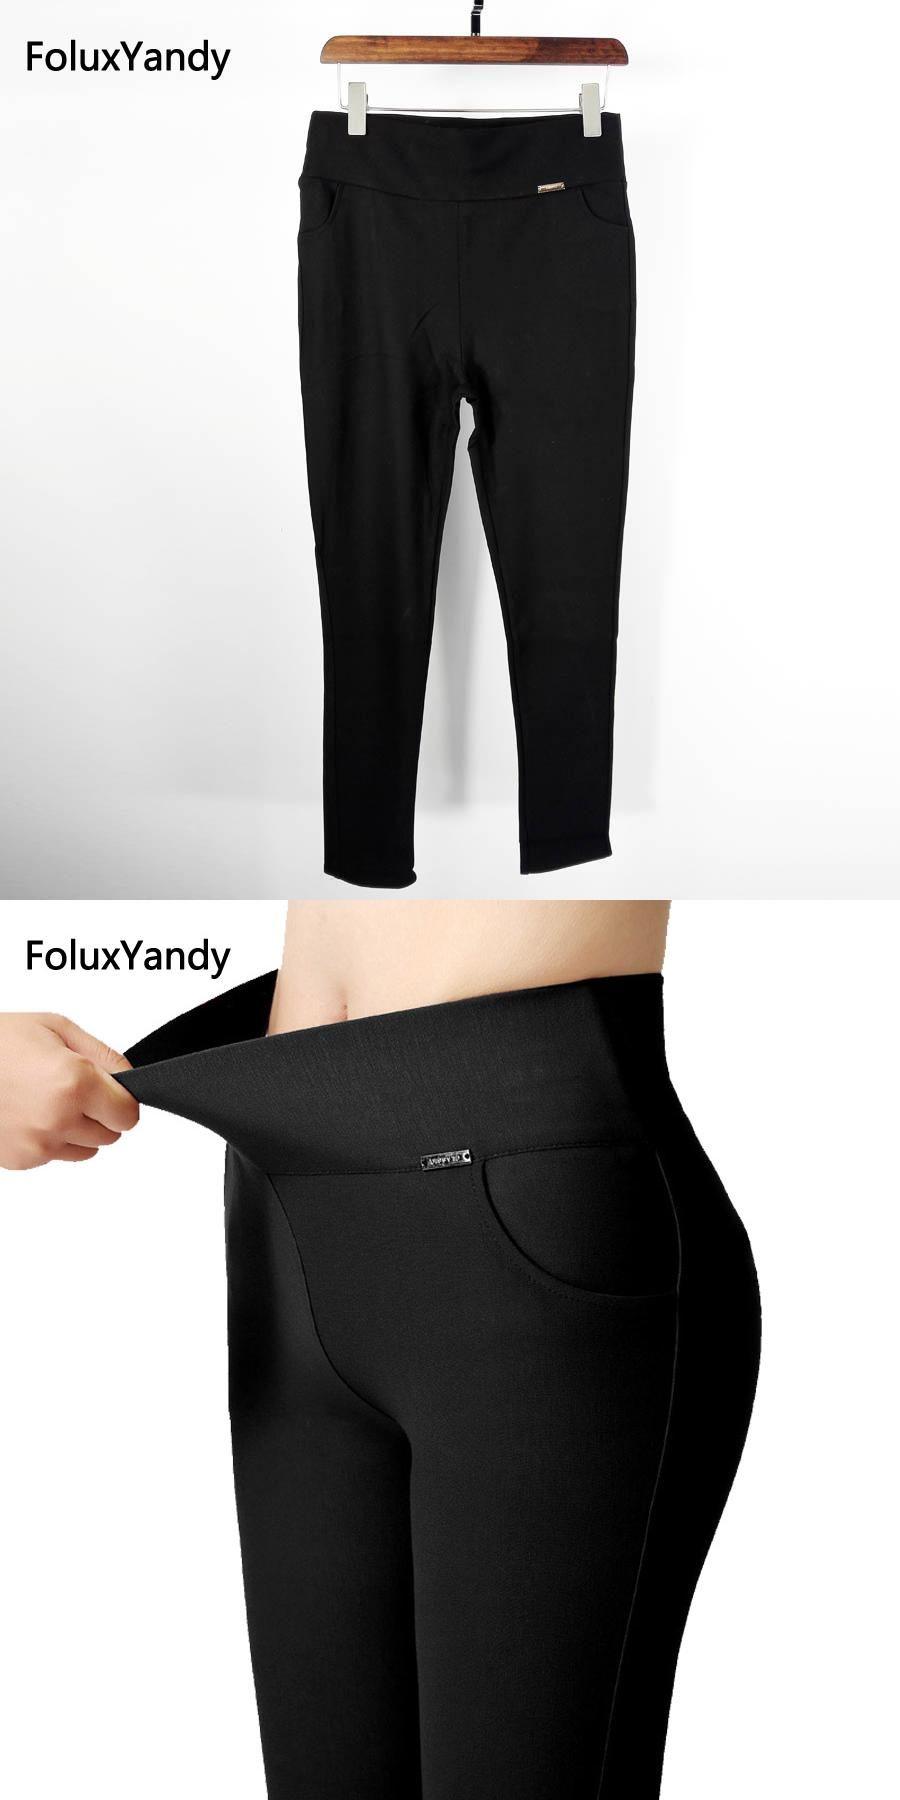 1161f53b7e1 6 Colors High Waist Leggings Women Plus Size 3 XL Slim Elastic Stretched  Bodycon Leggings Office Lady Trousers NJR02